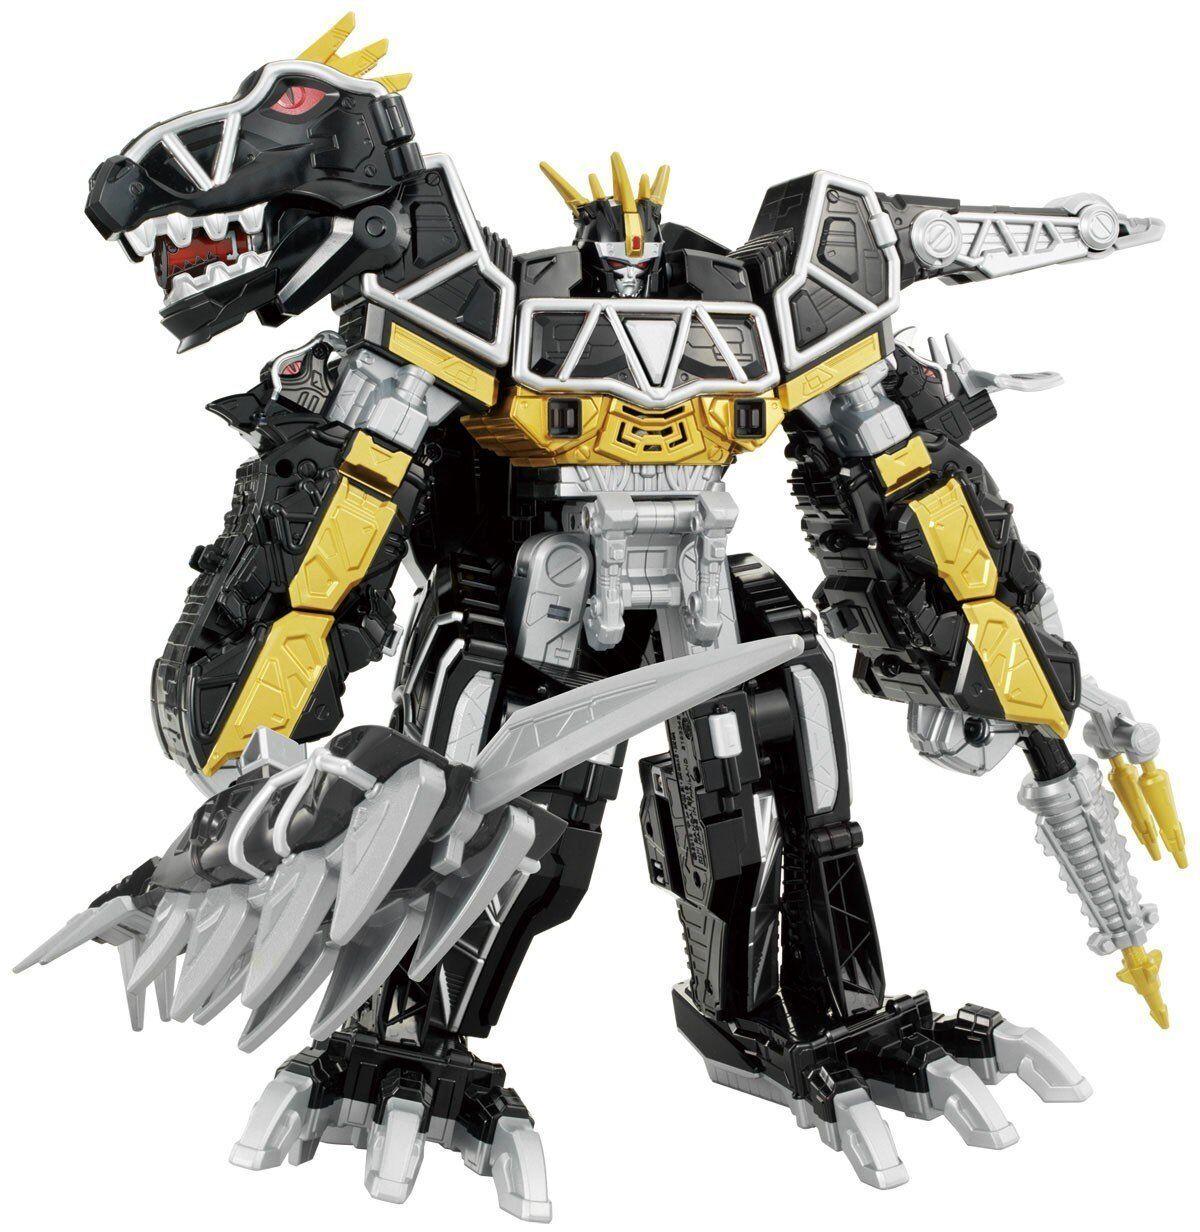 BANDAI DX Kyoryuzin Dark Version Megazord Power Rangers Zyuden-Sentai Kyoryuger